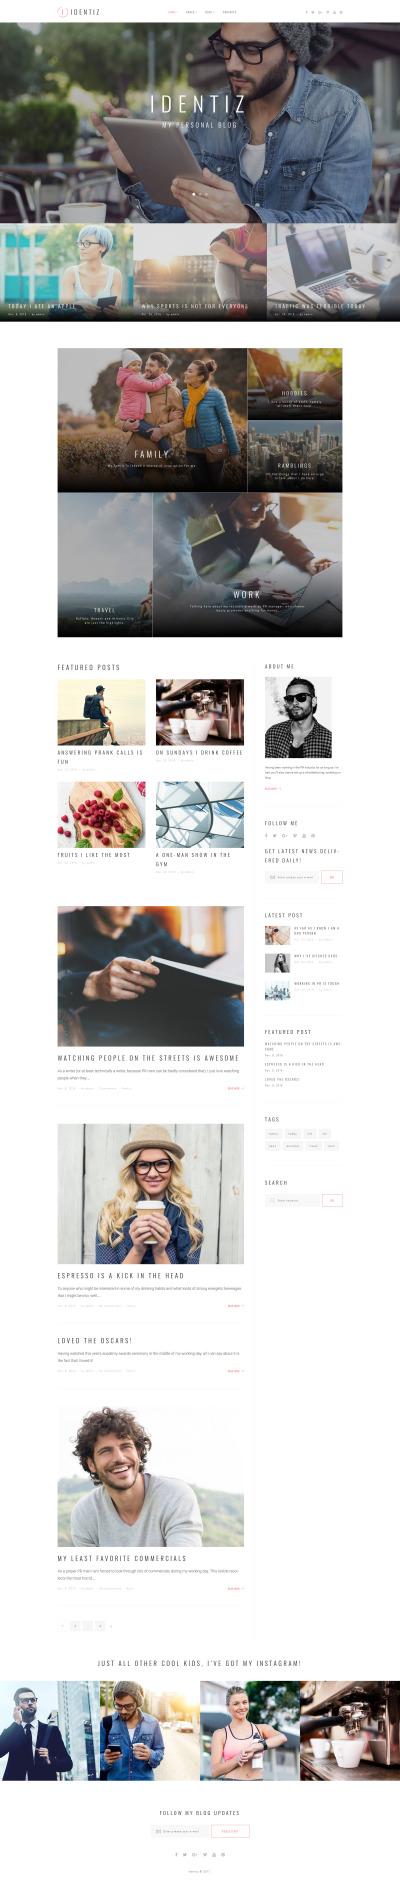 Identiz - Personal Blog WordPress Theme #63592